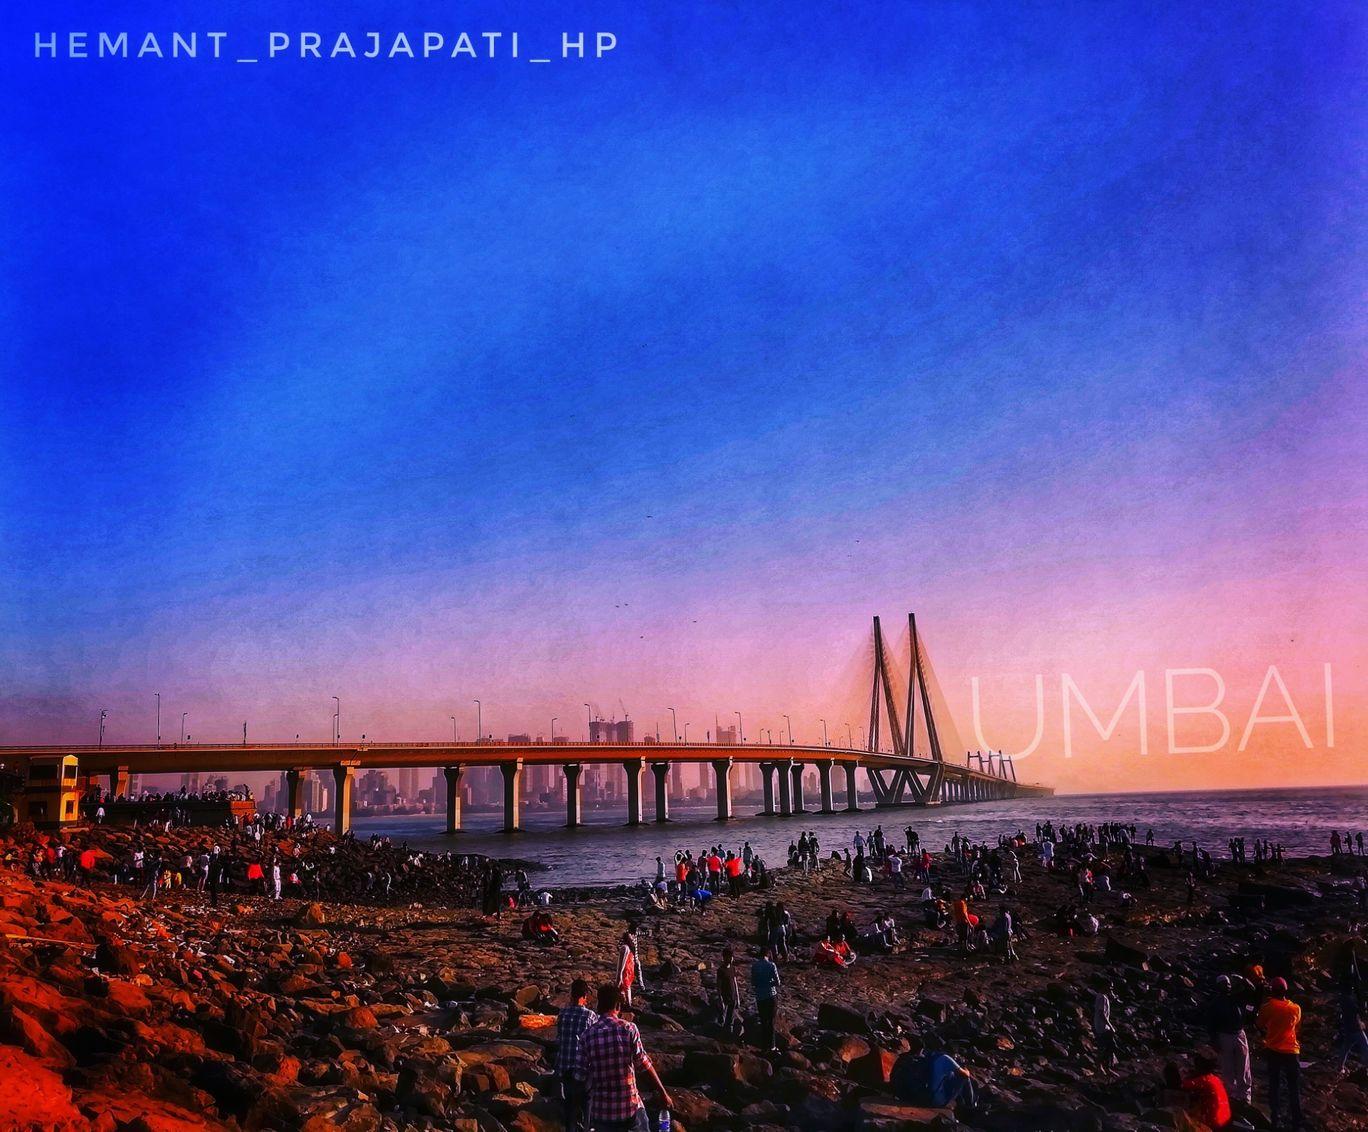 Photo of Bandstand Promenade By Hemant Prajapat